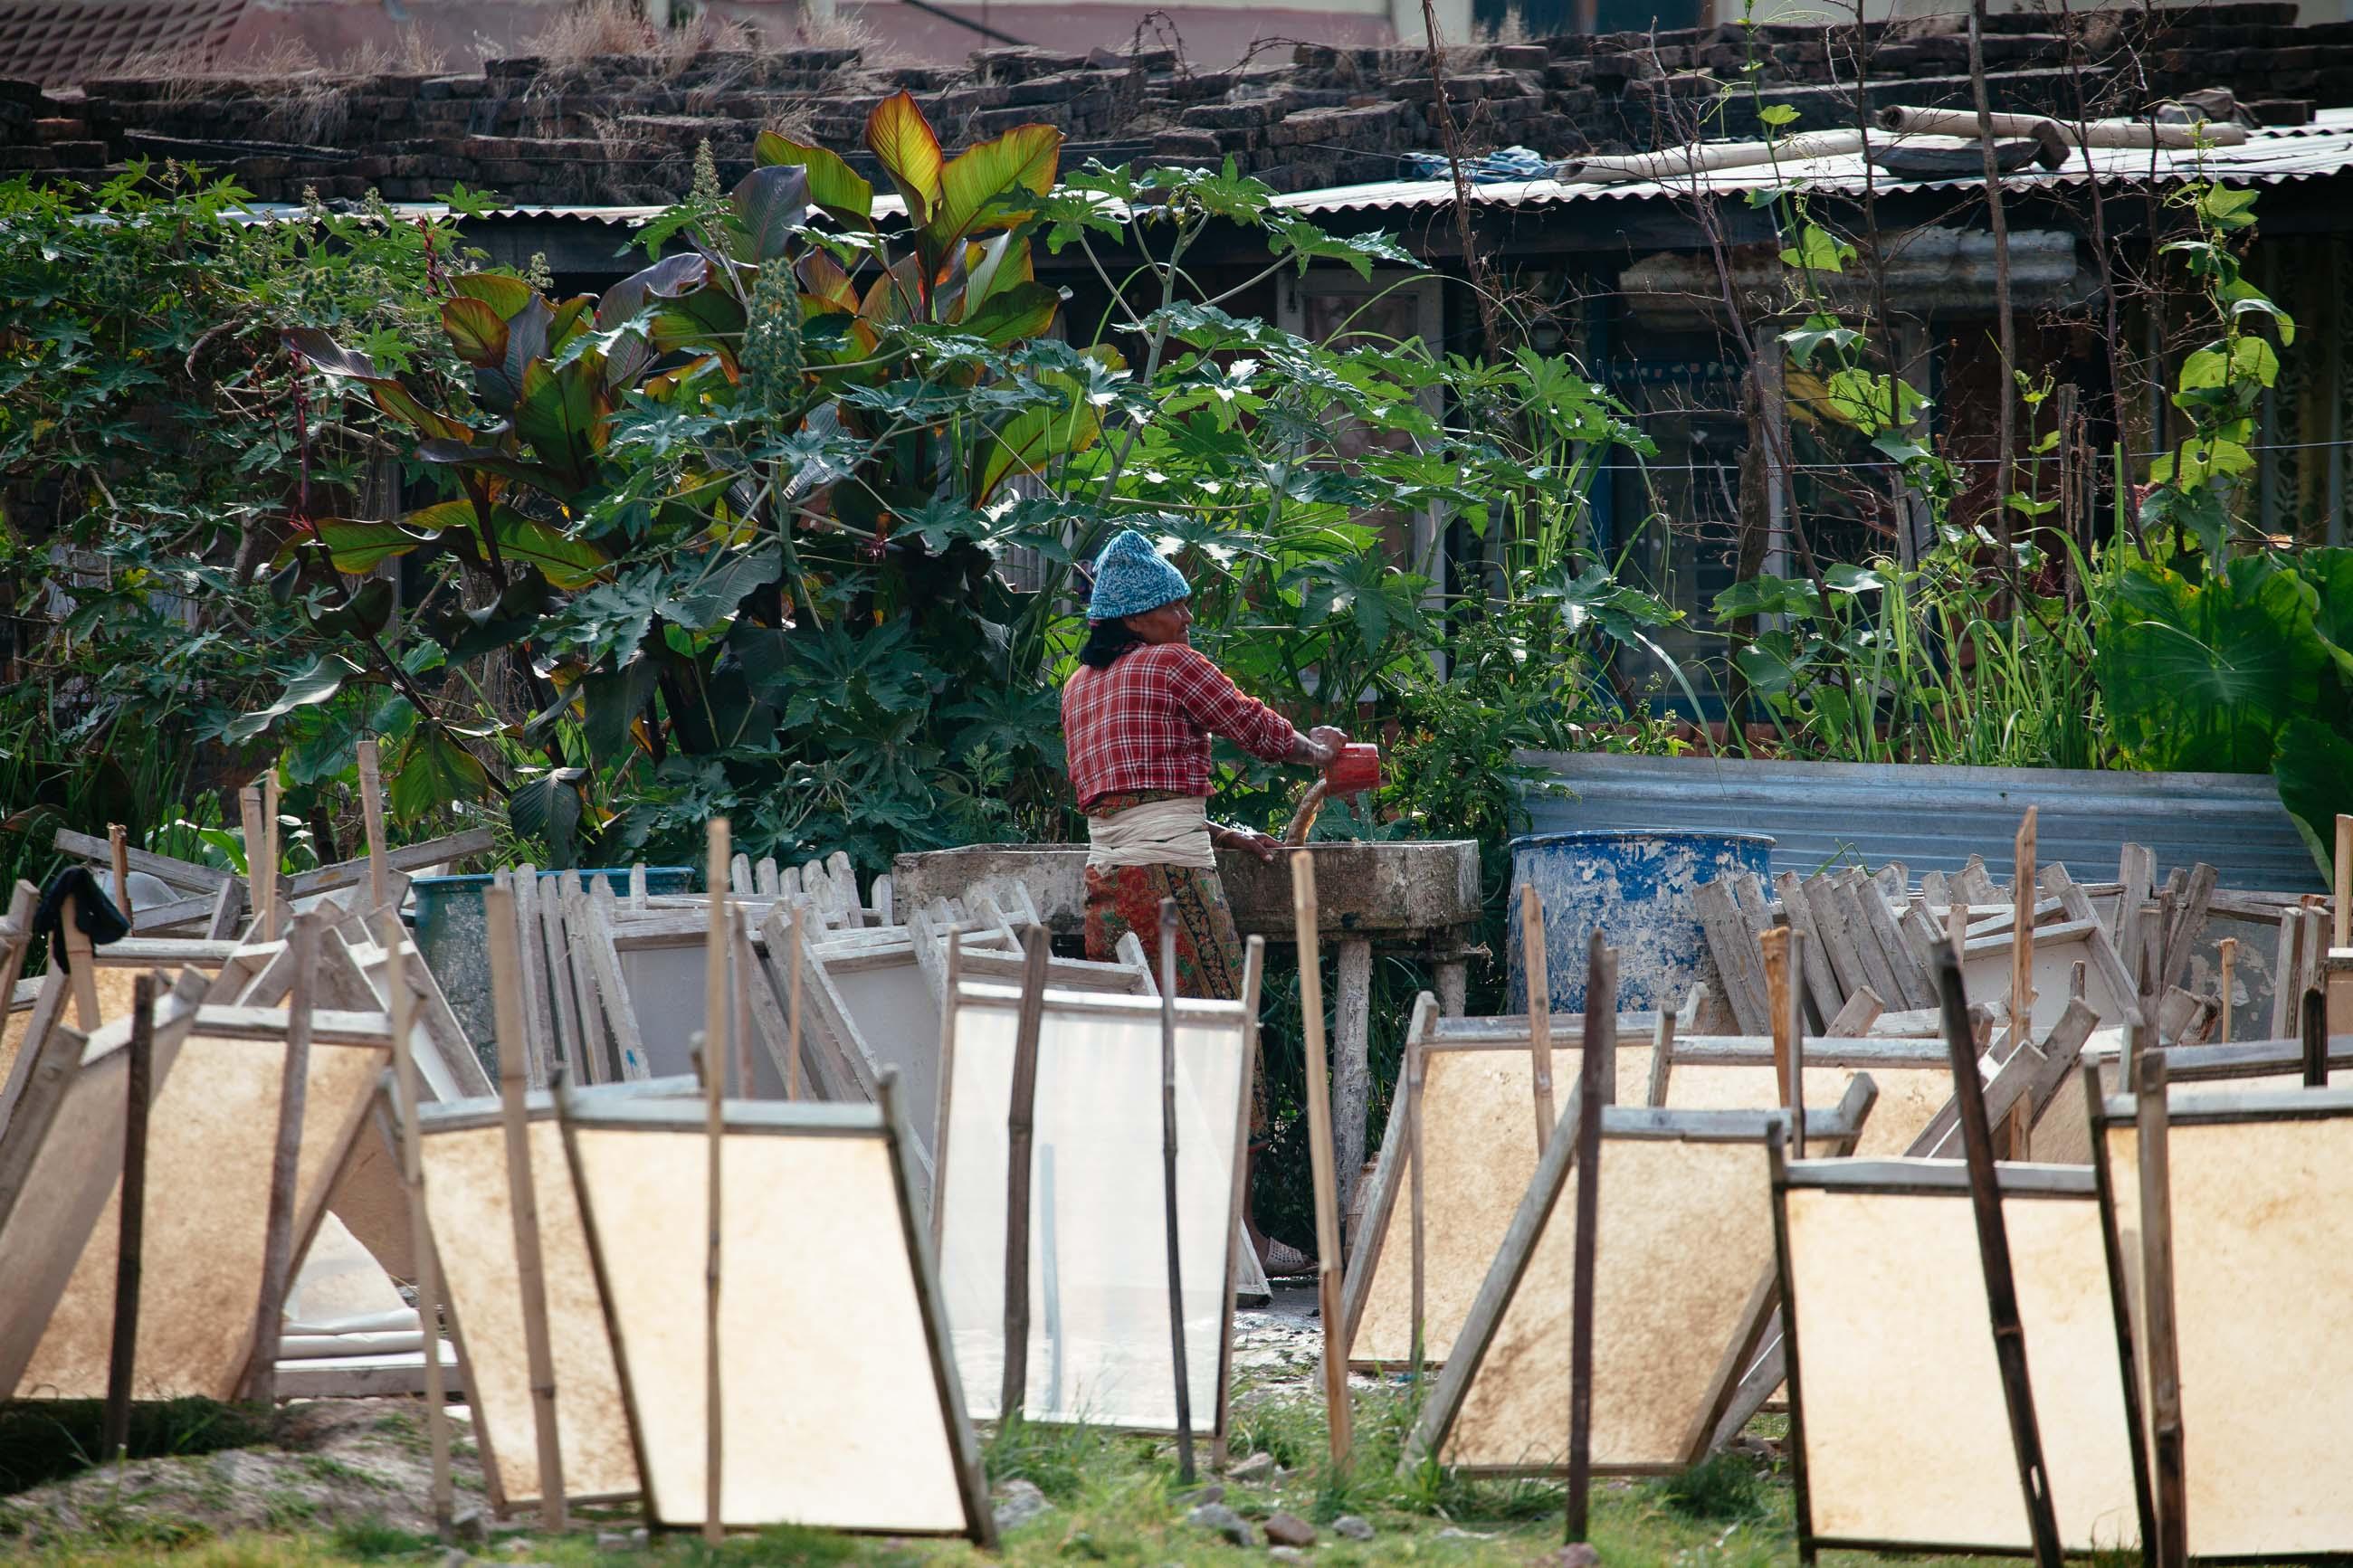 Making Paper in Kathmandu, Nepal Jun 2015